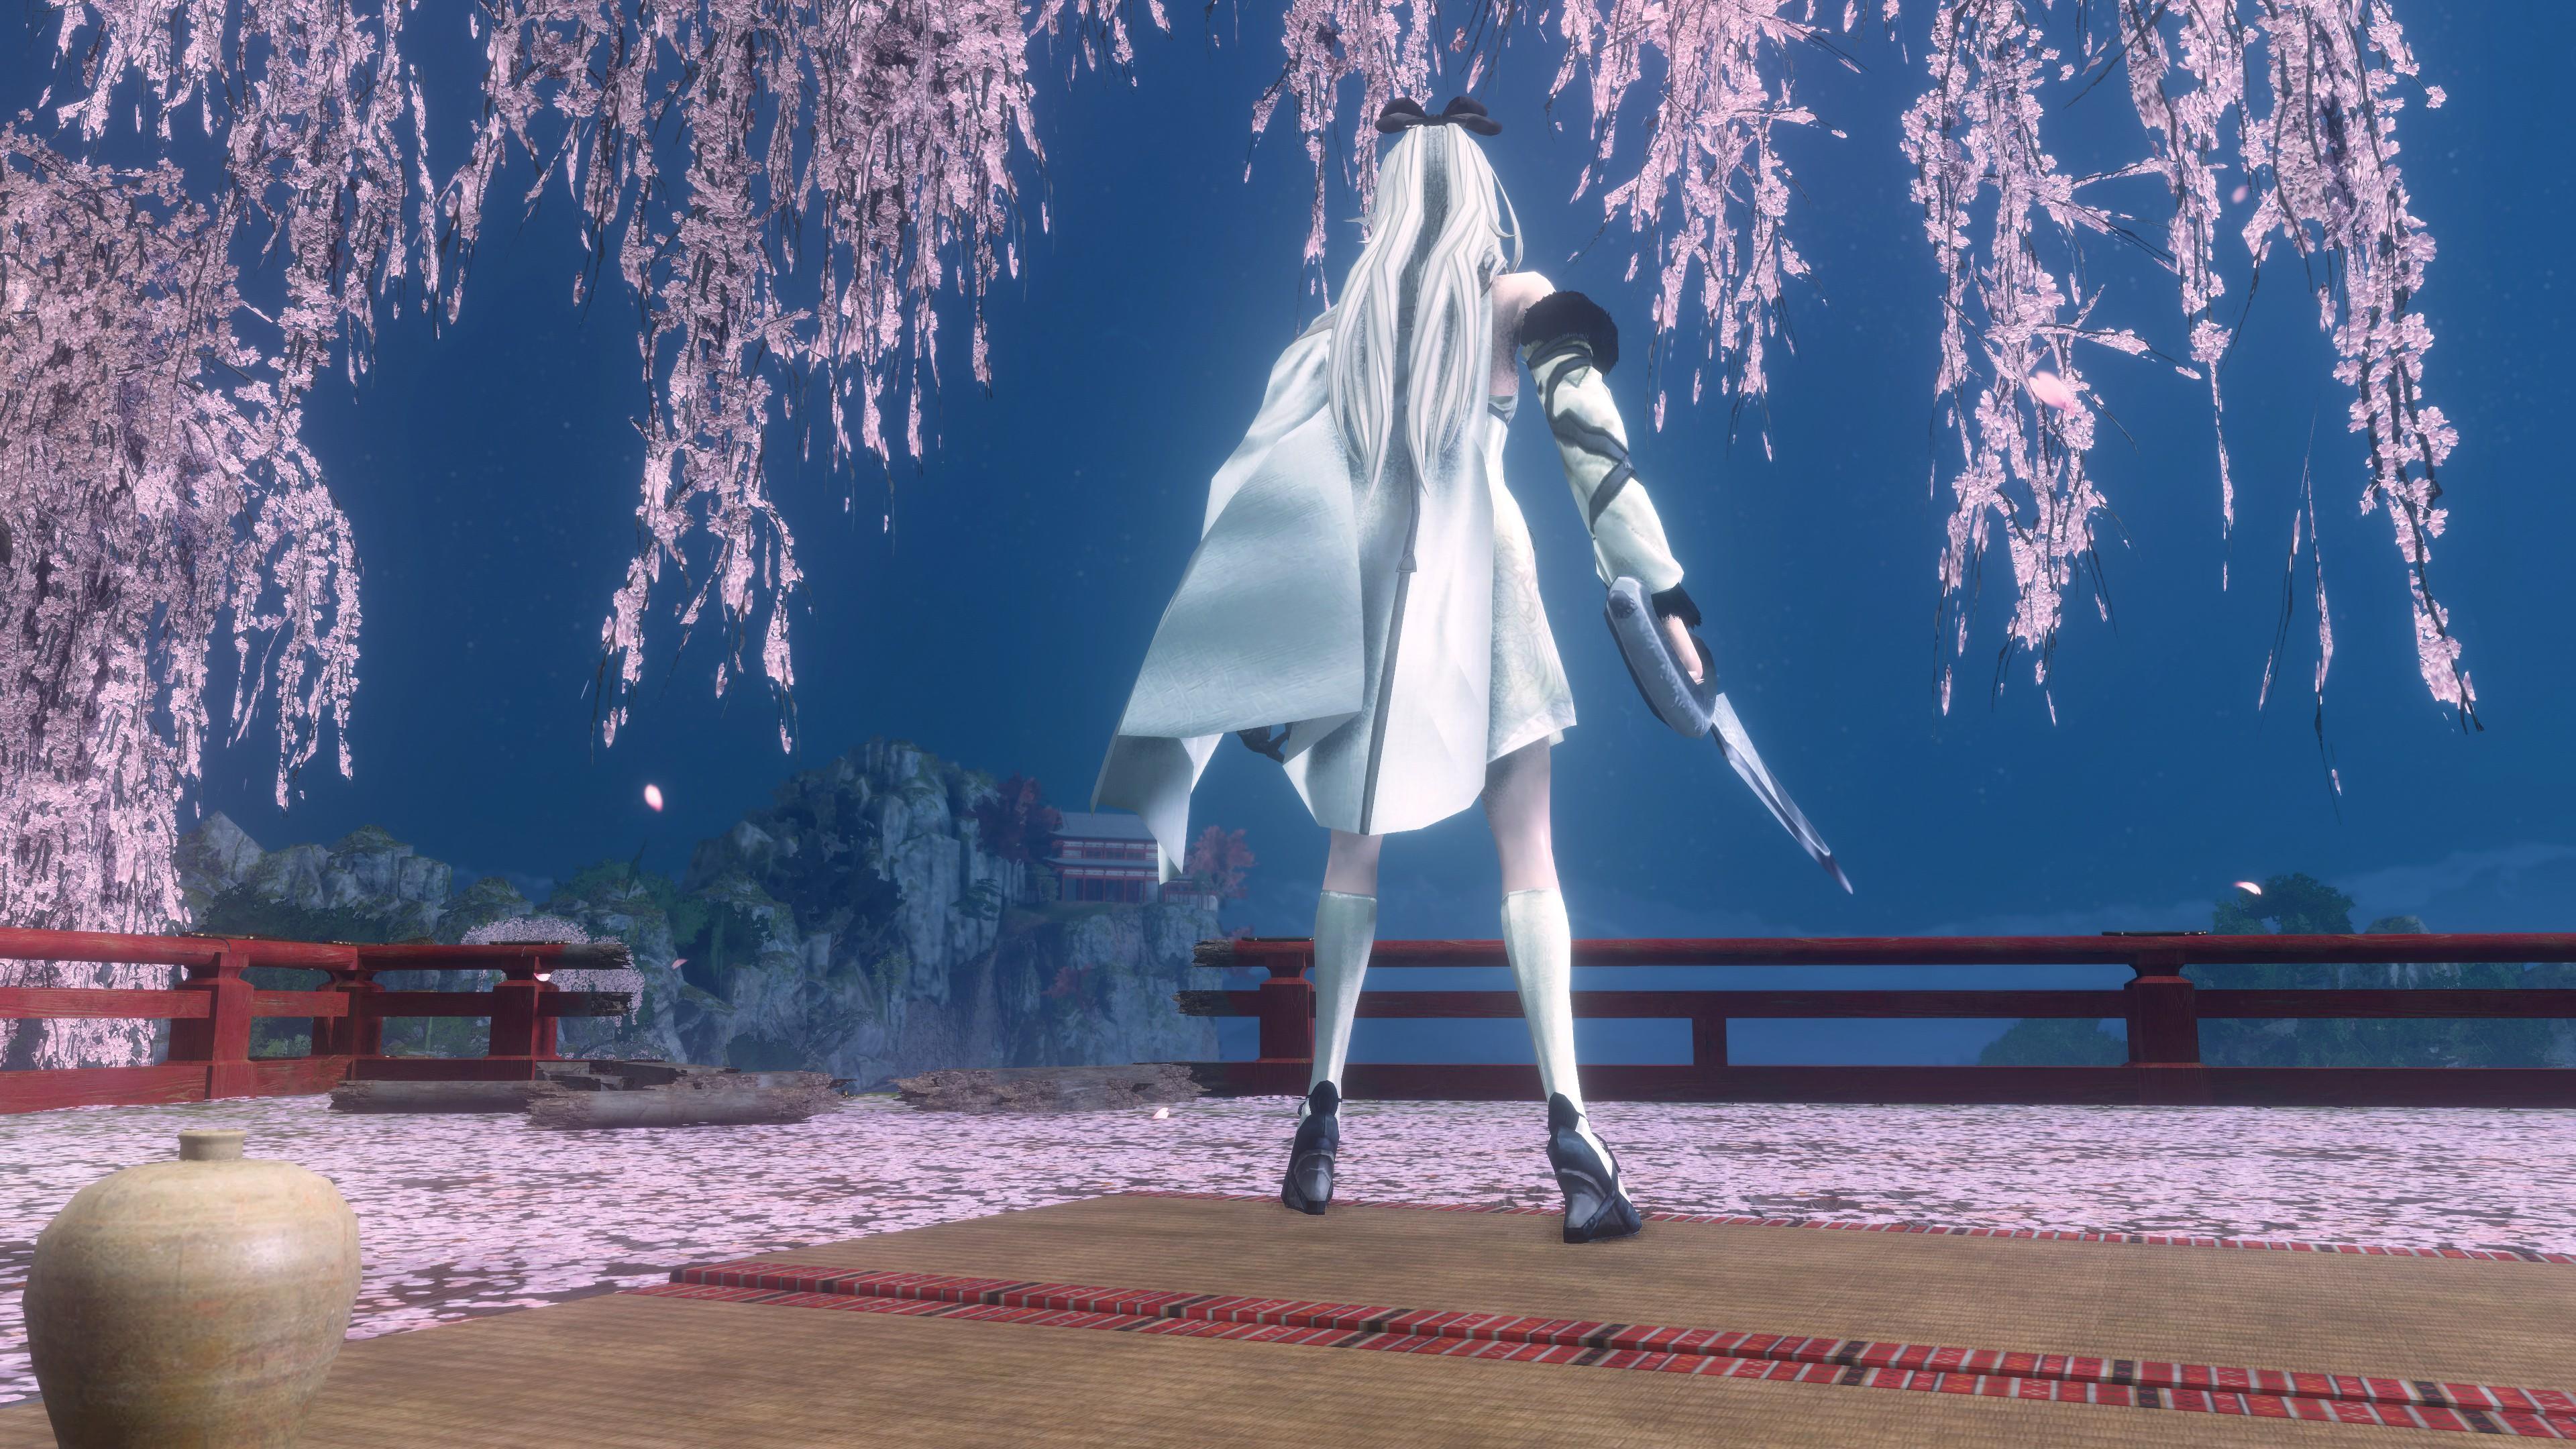 Zero - Sekiro: Shadows Die Twice